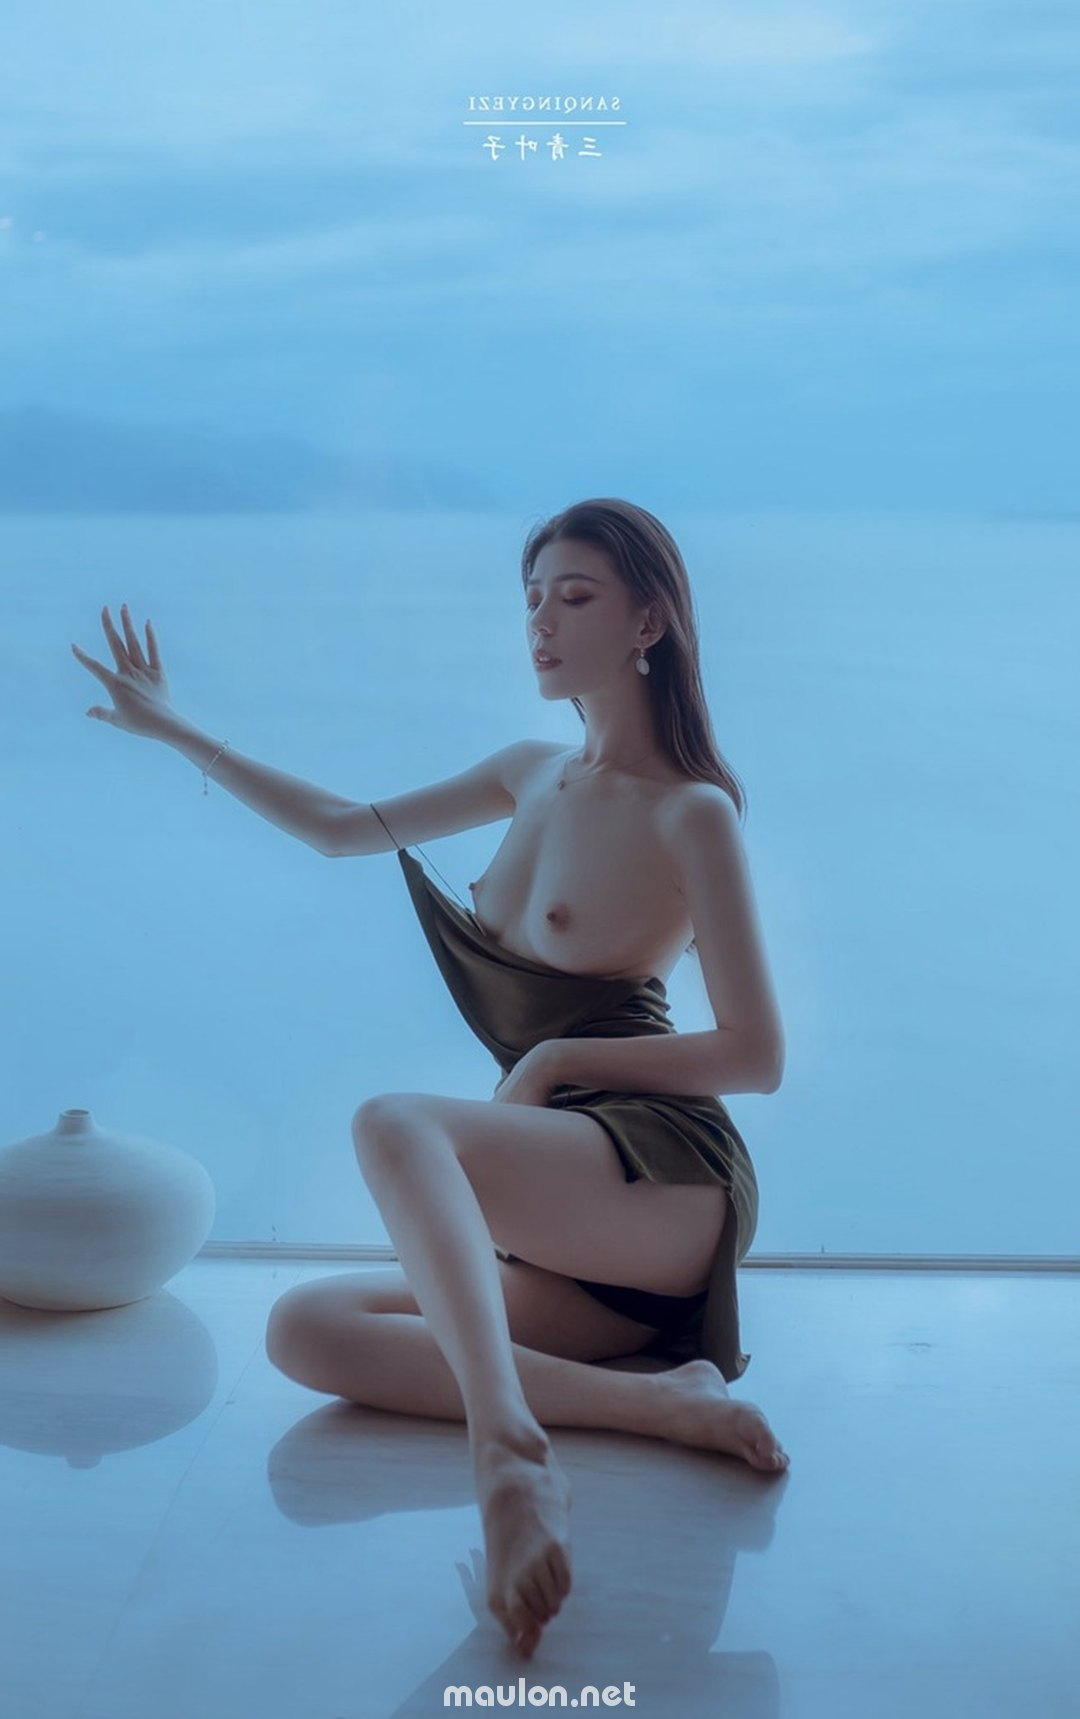 AnhSex.In - Ảnh sex em hot girl siêu nuột